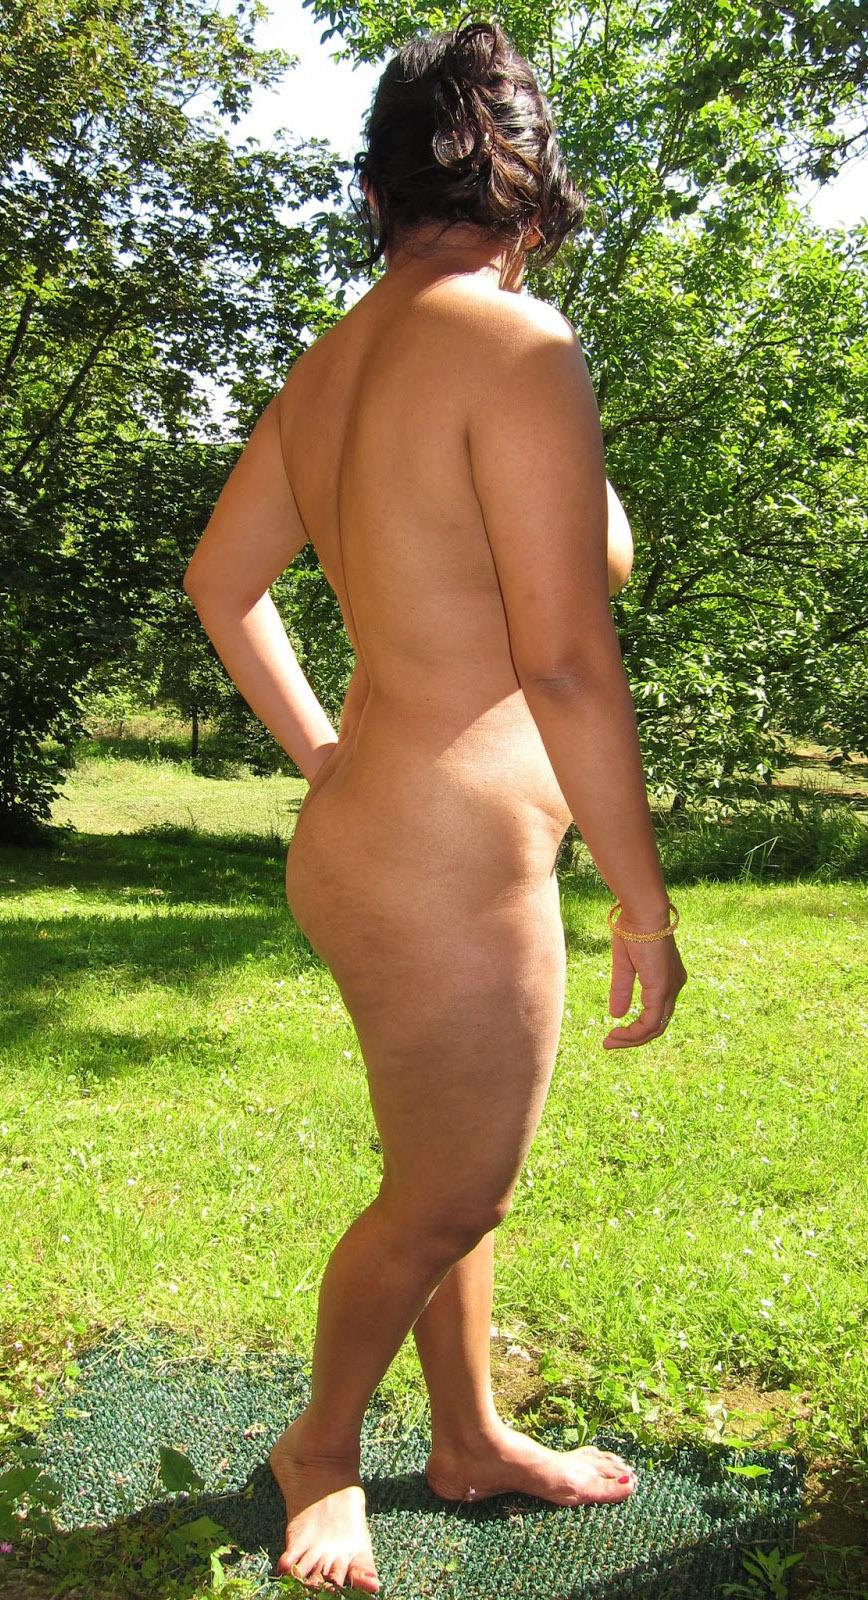 Desi Girls Aunties Blowjob Delhi Bhabhi Big Nude Ass Image In Garden-5206